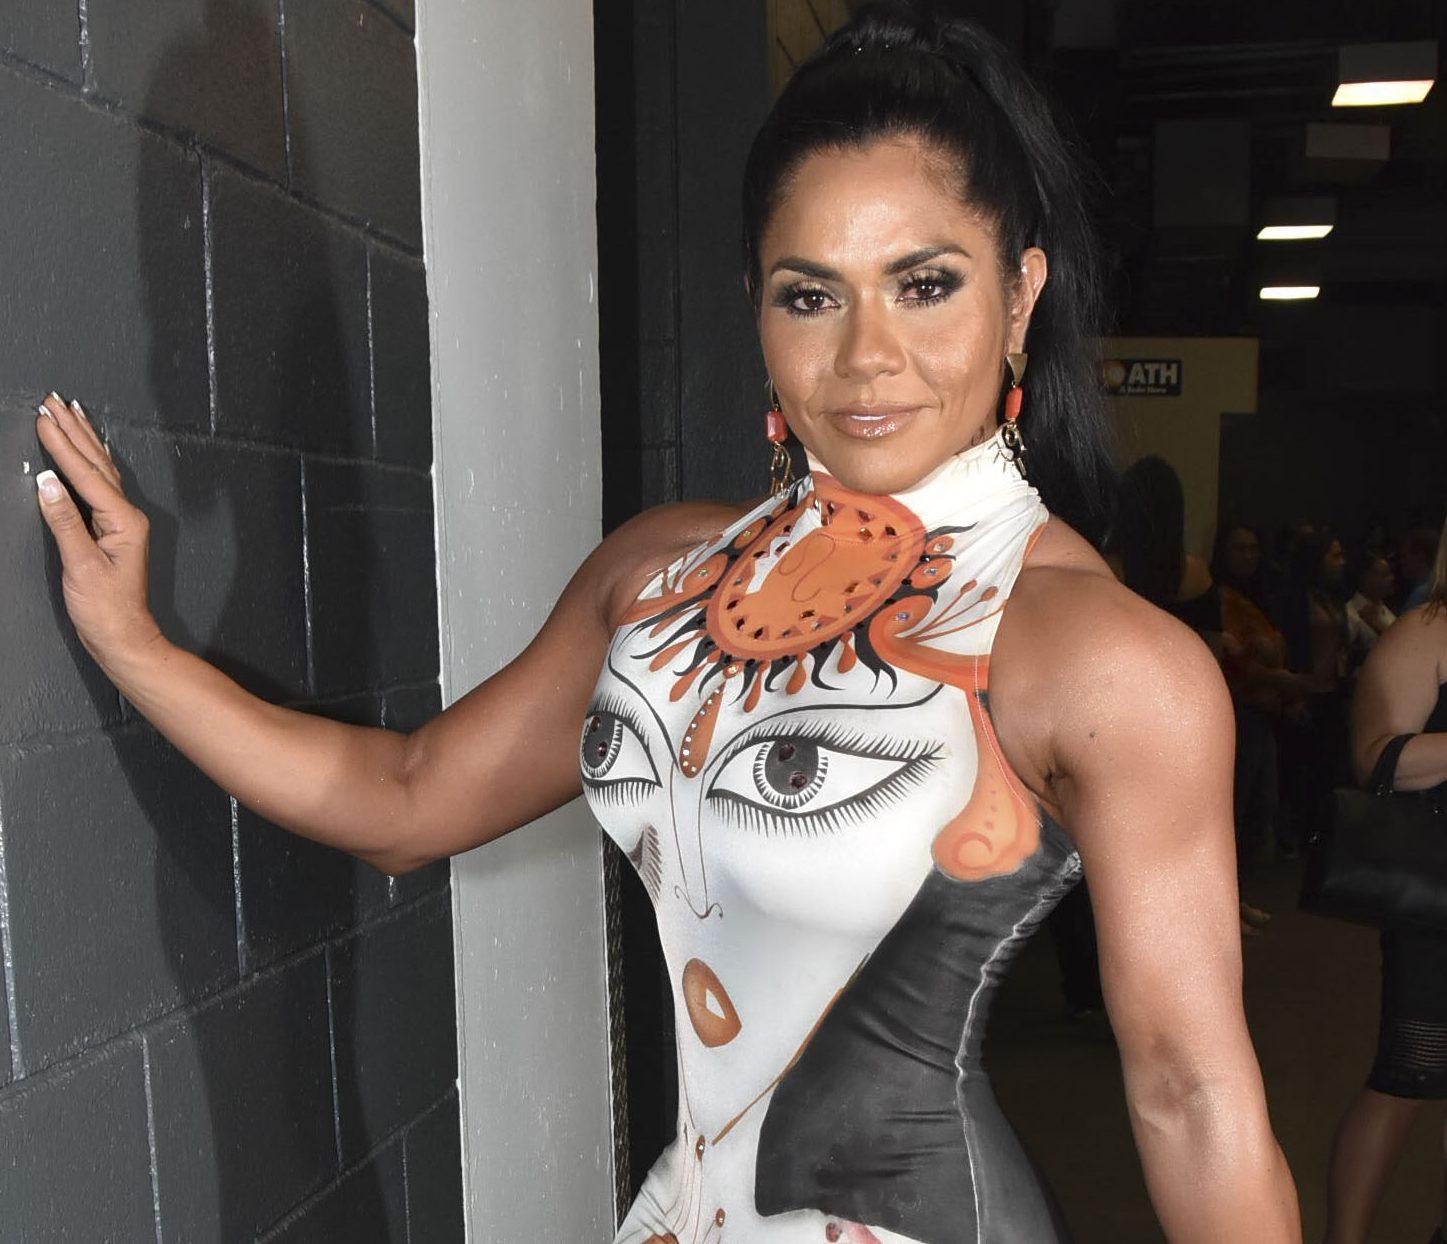 Maripily Rivera se estira su tanga amarilla y presume su